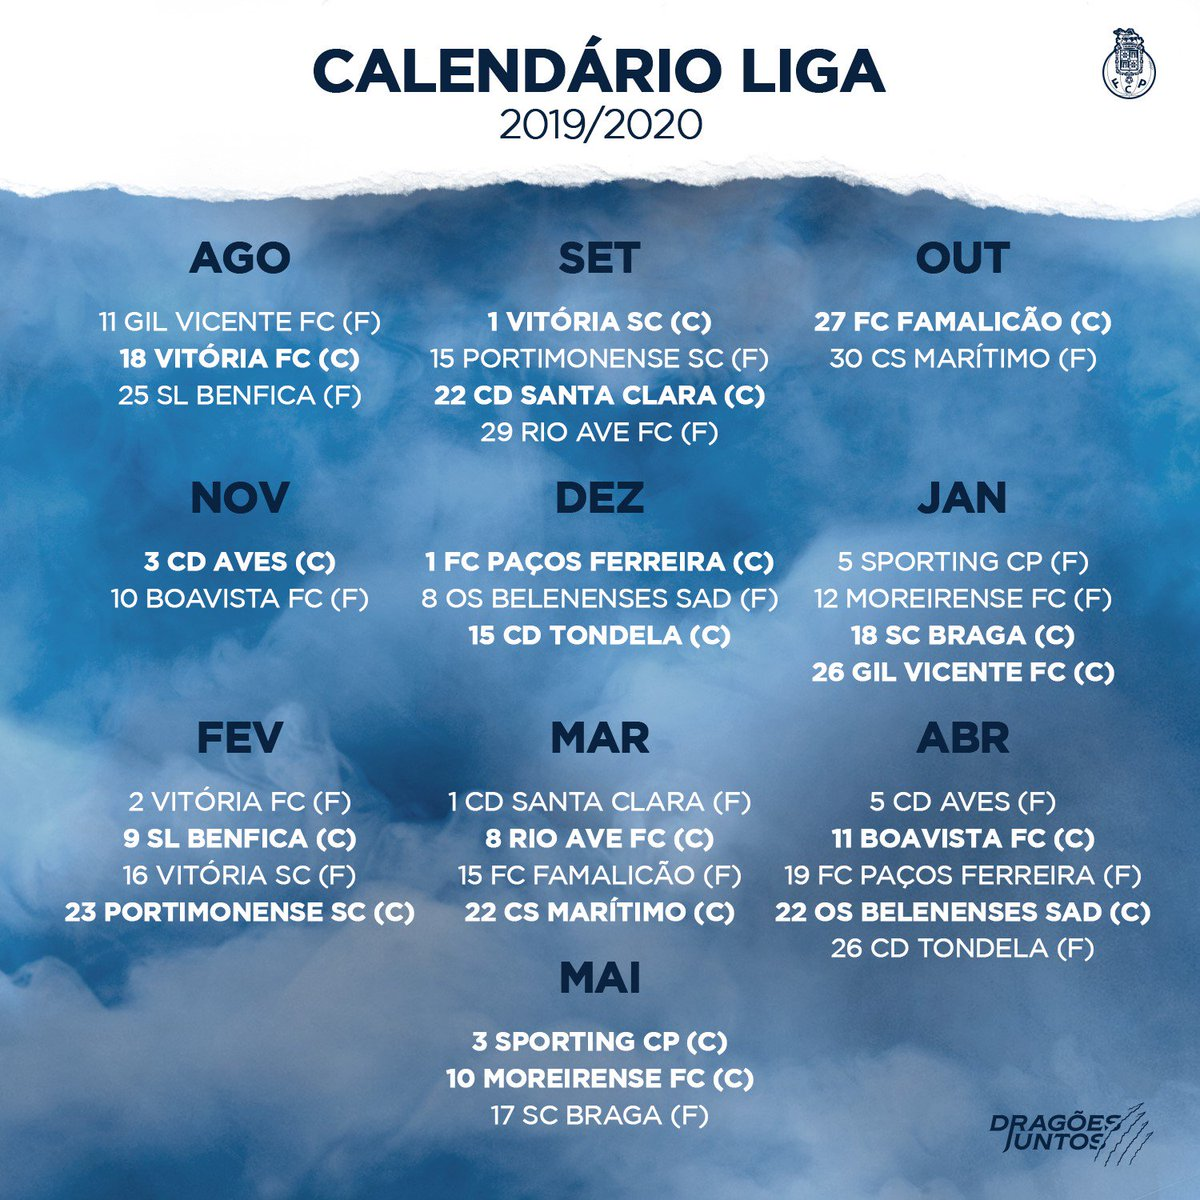 Calendario F.Fc Porto On Twitter Savethedate Calendario Da Liga